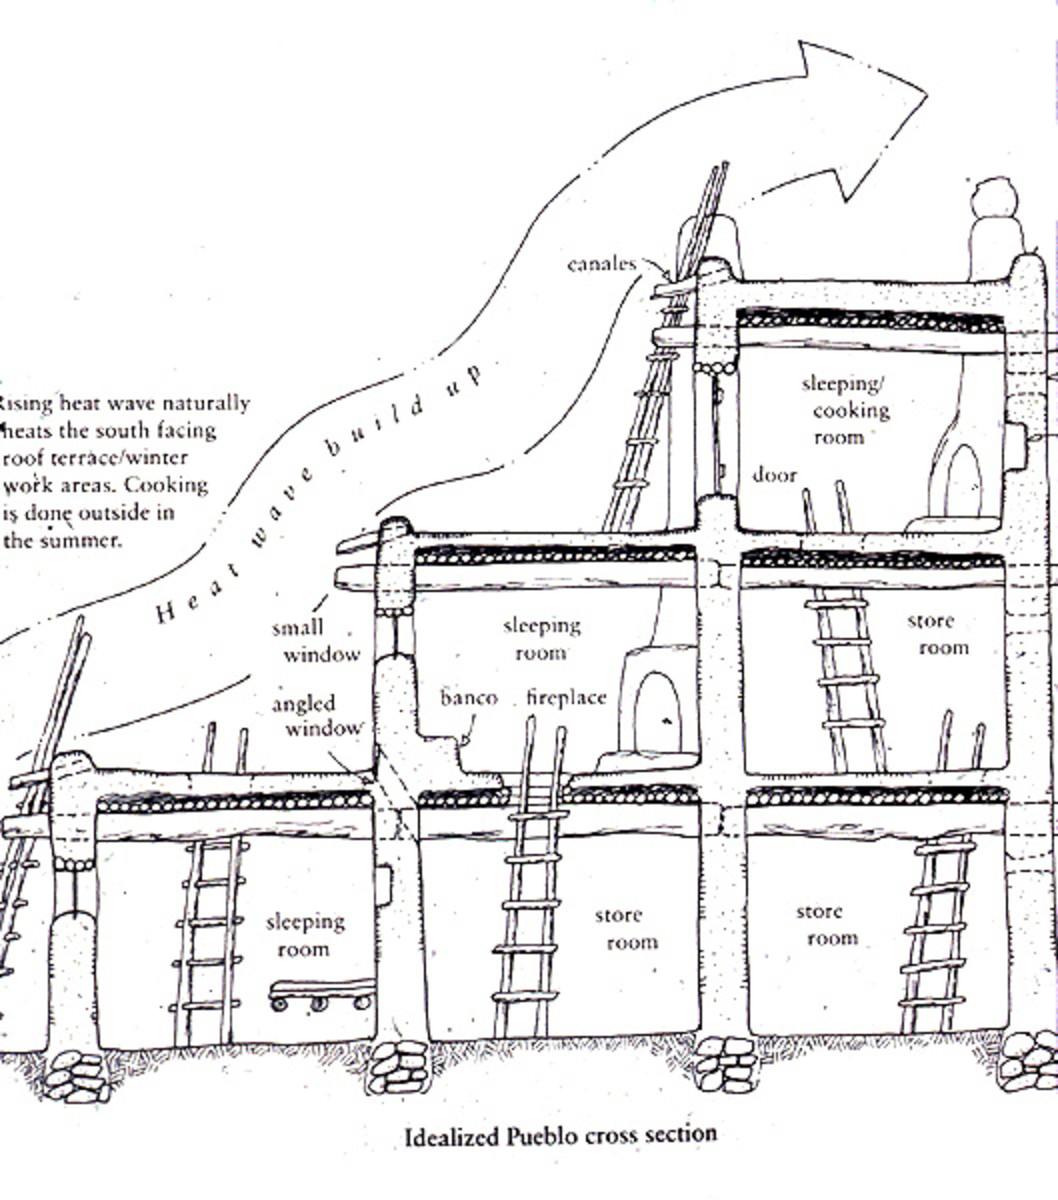 Cross-section of Pueblo architecture.